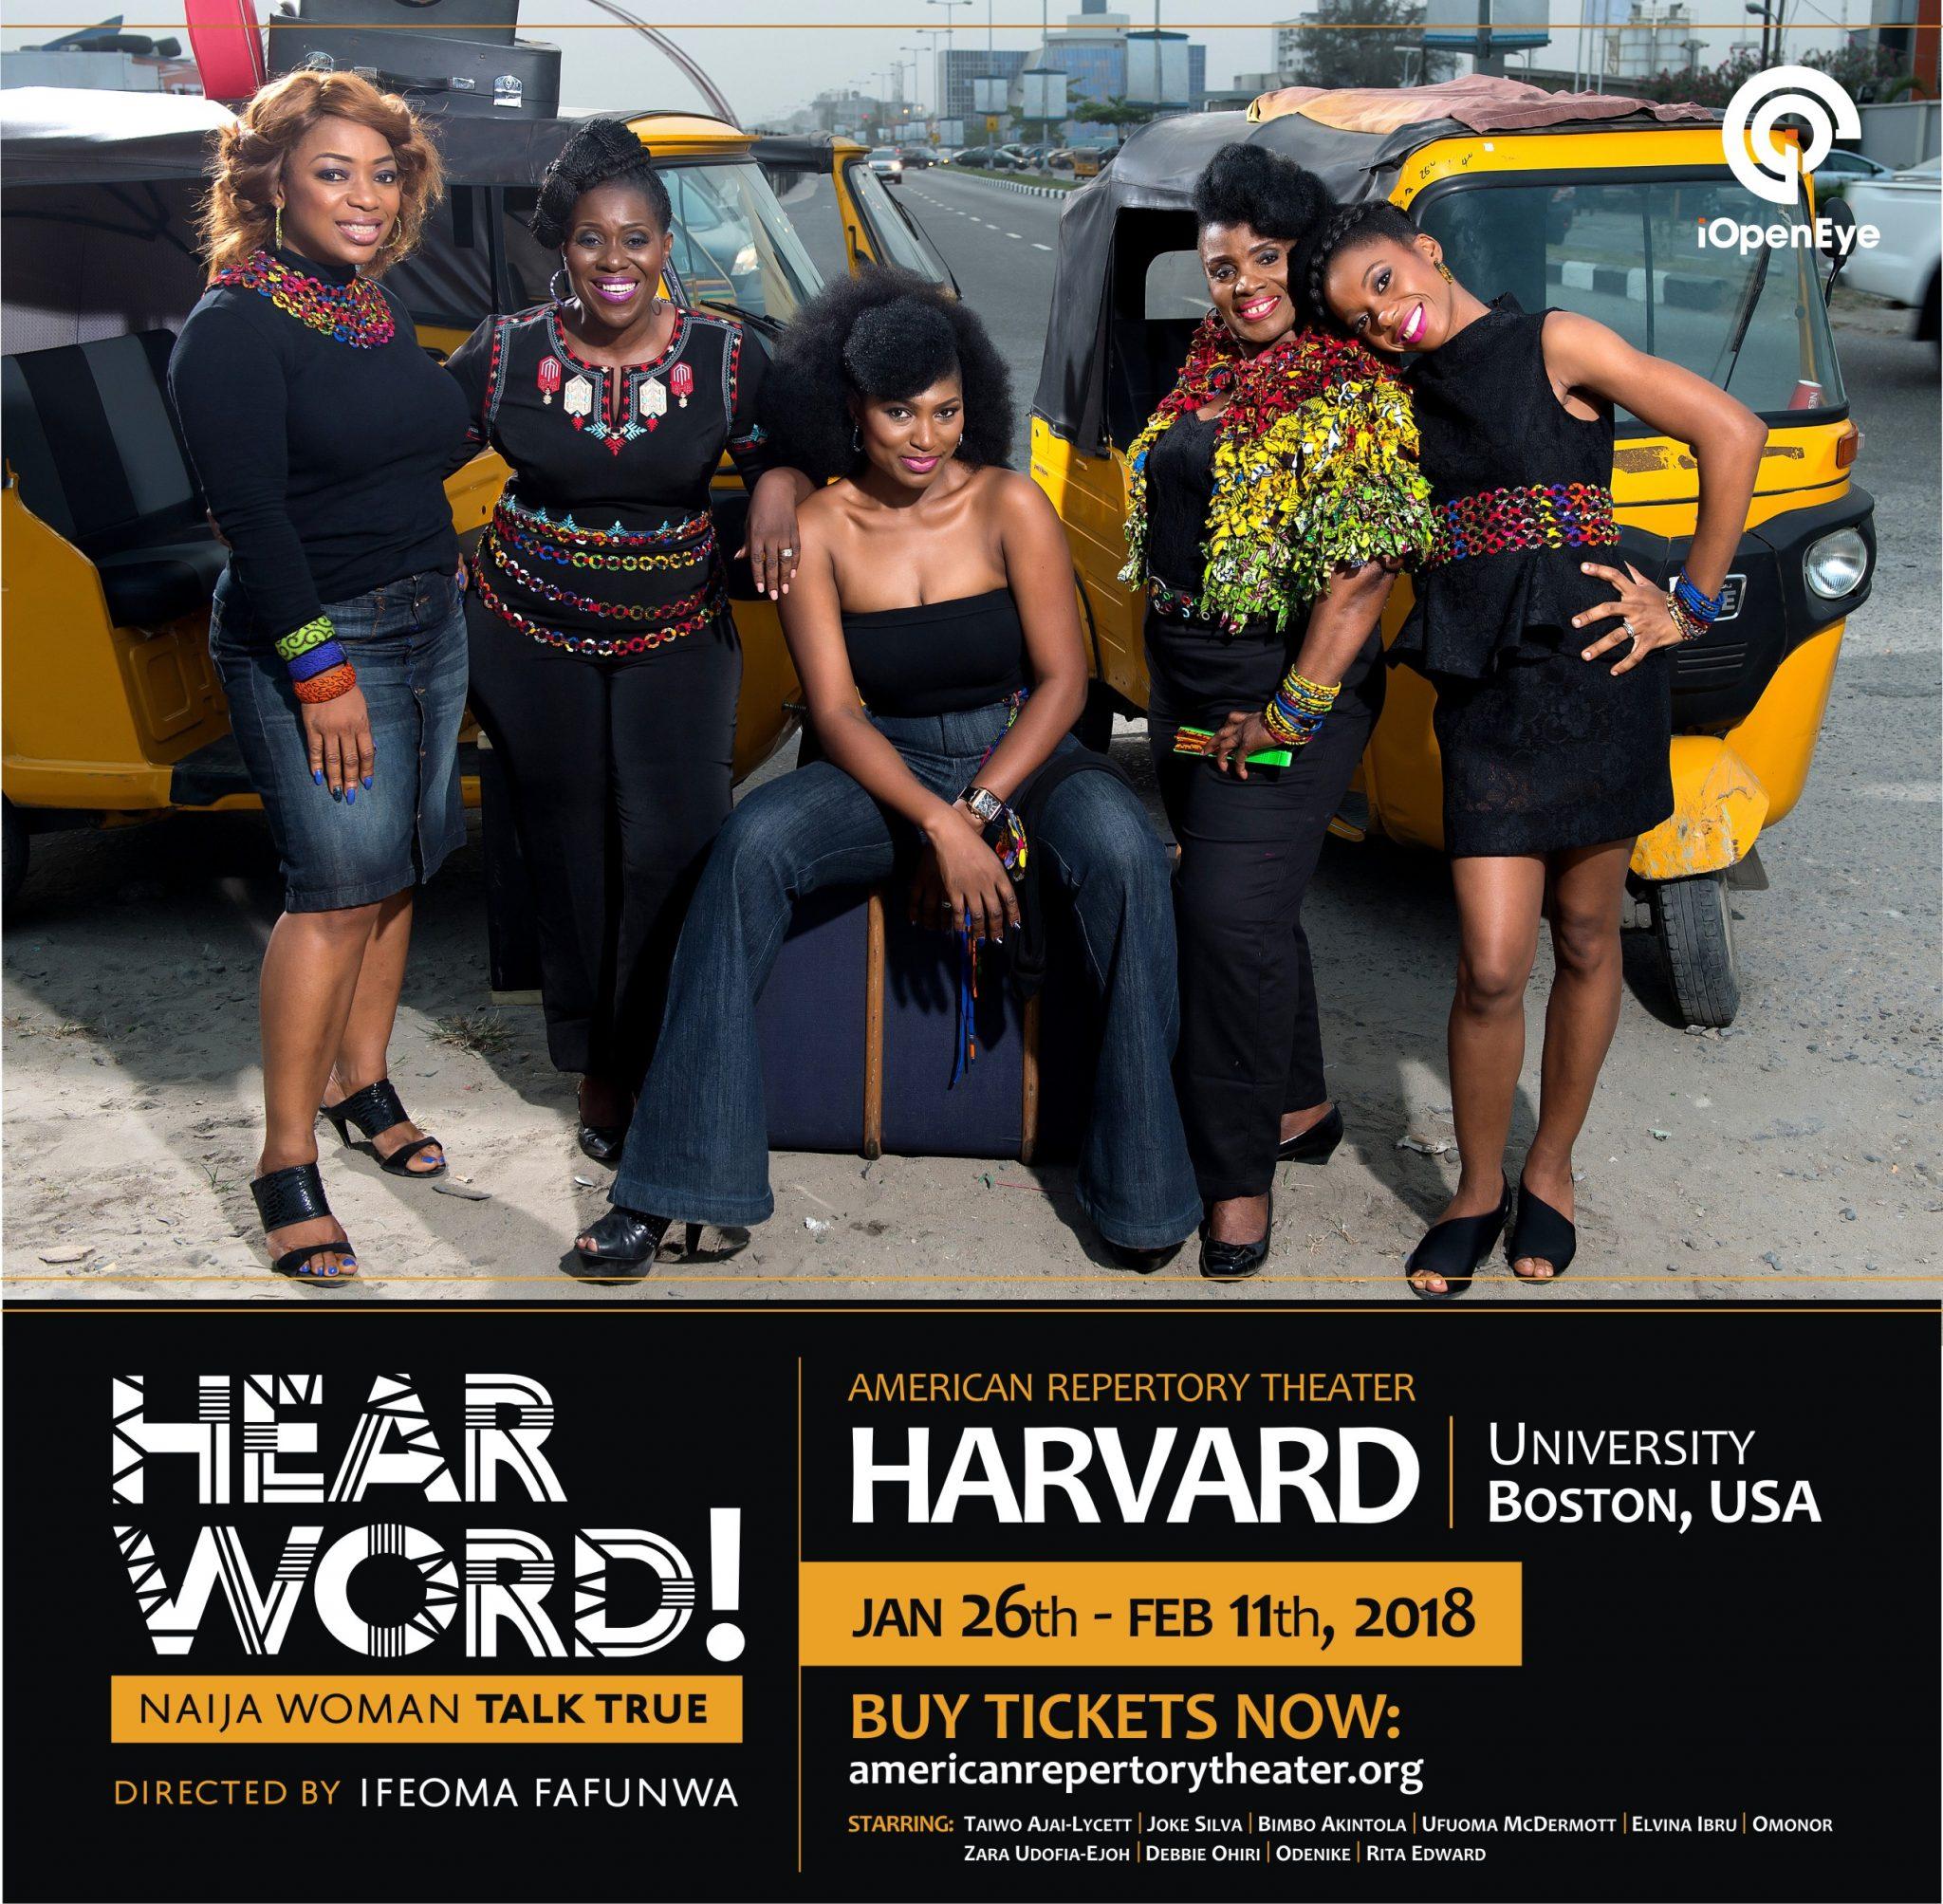 Hear Word! in Havard